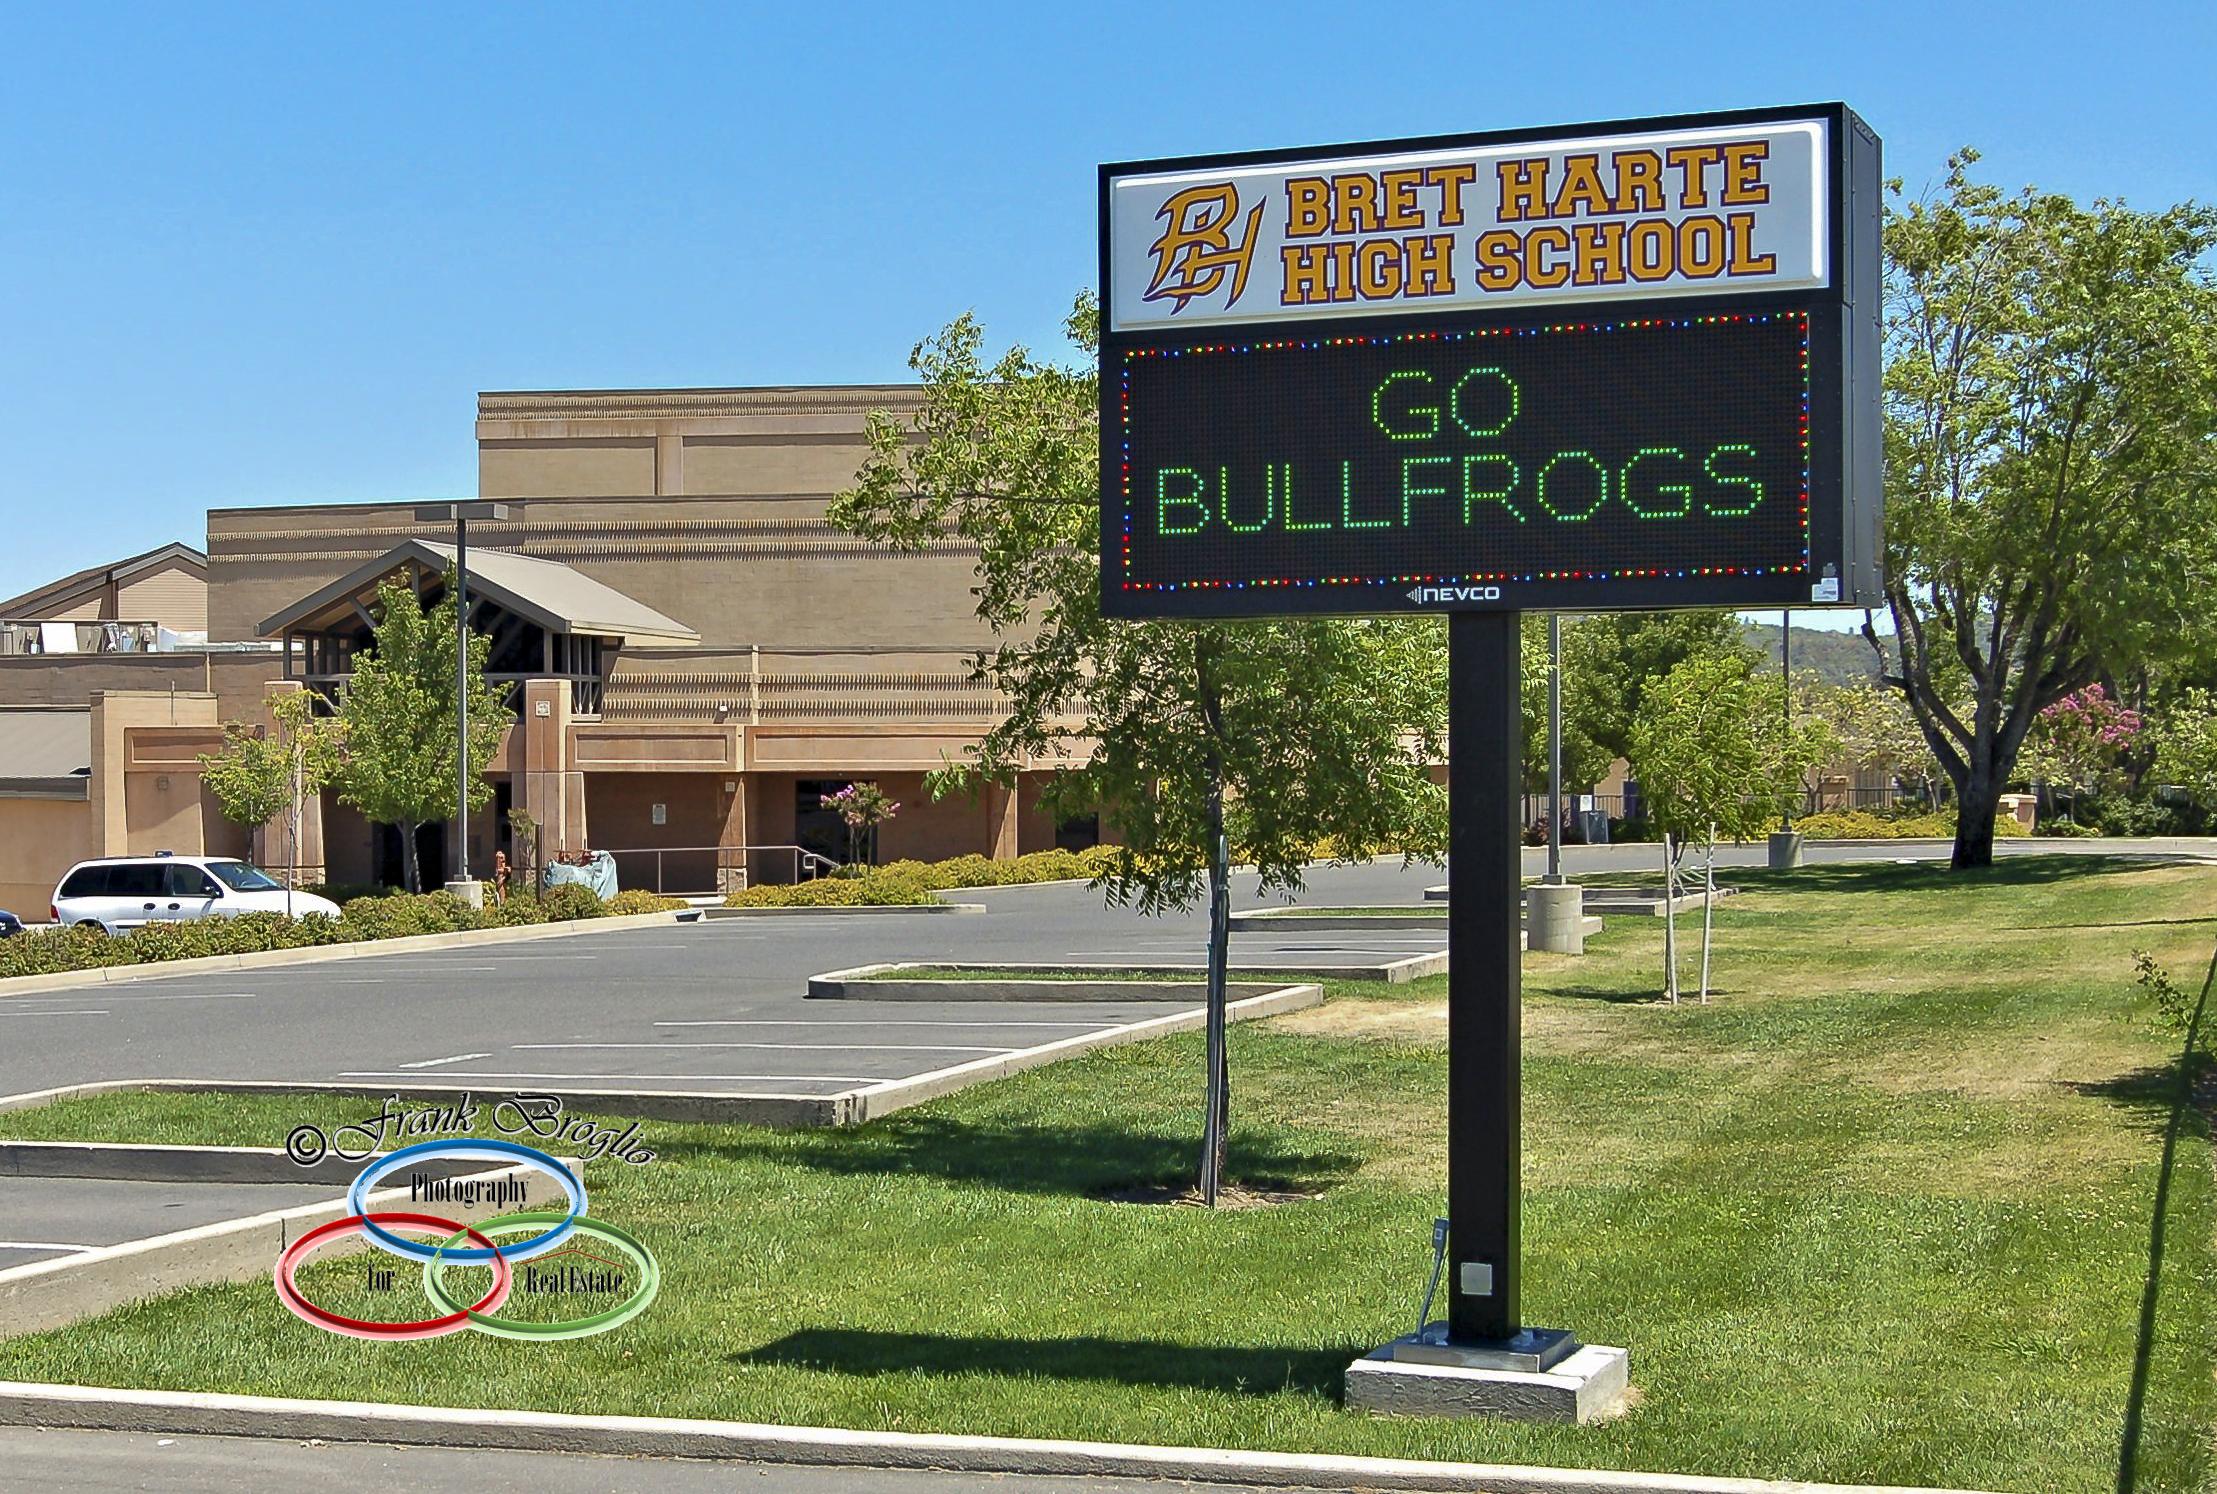 Go Bullfrogs!